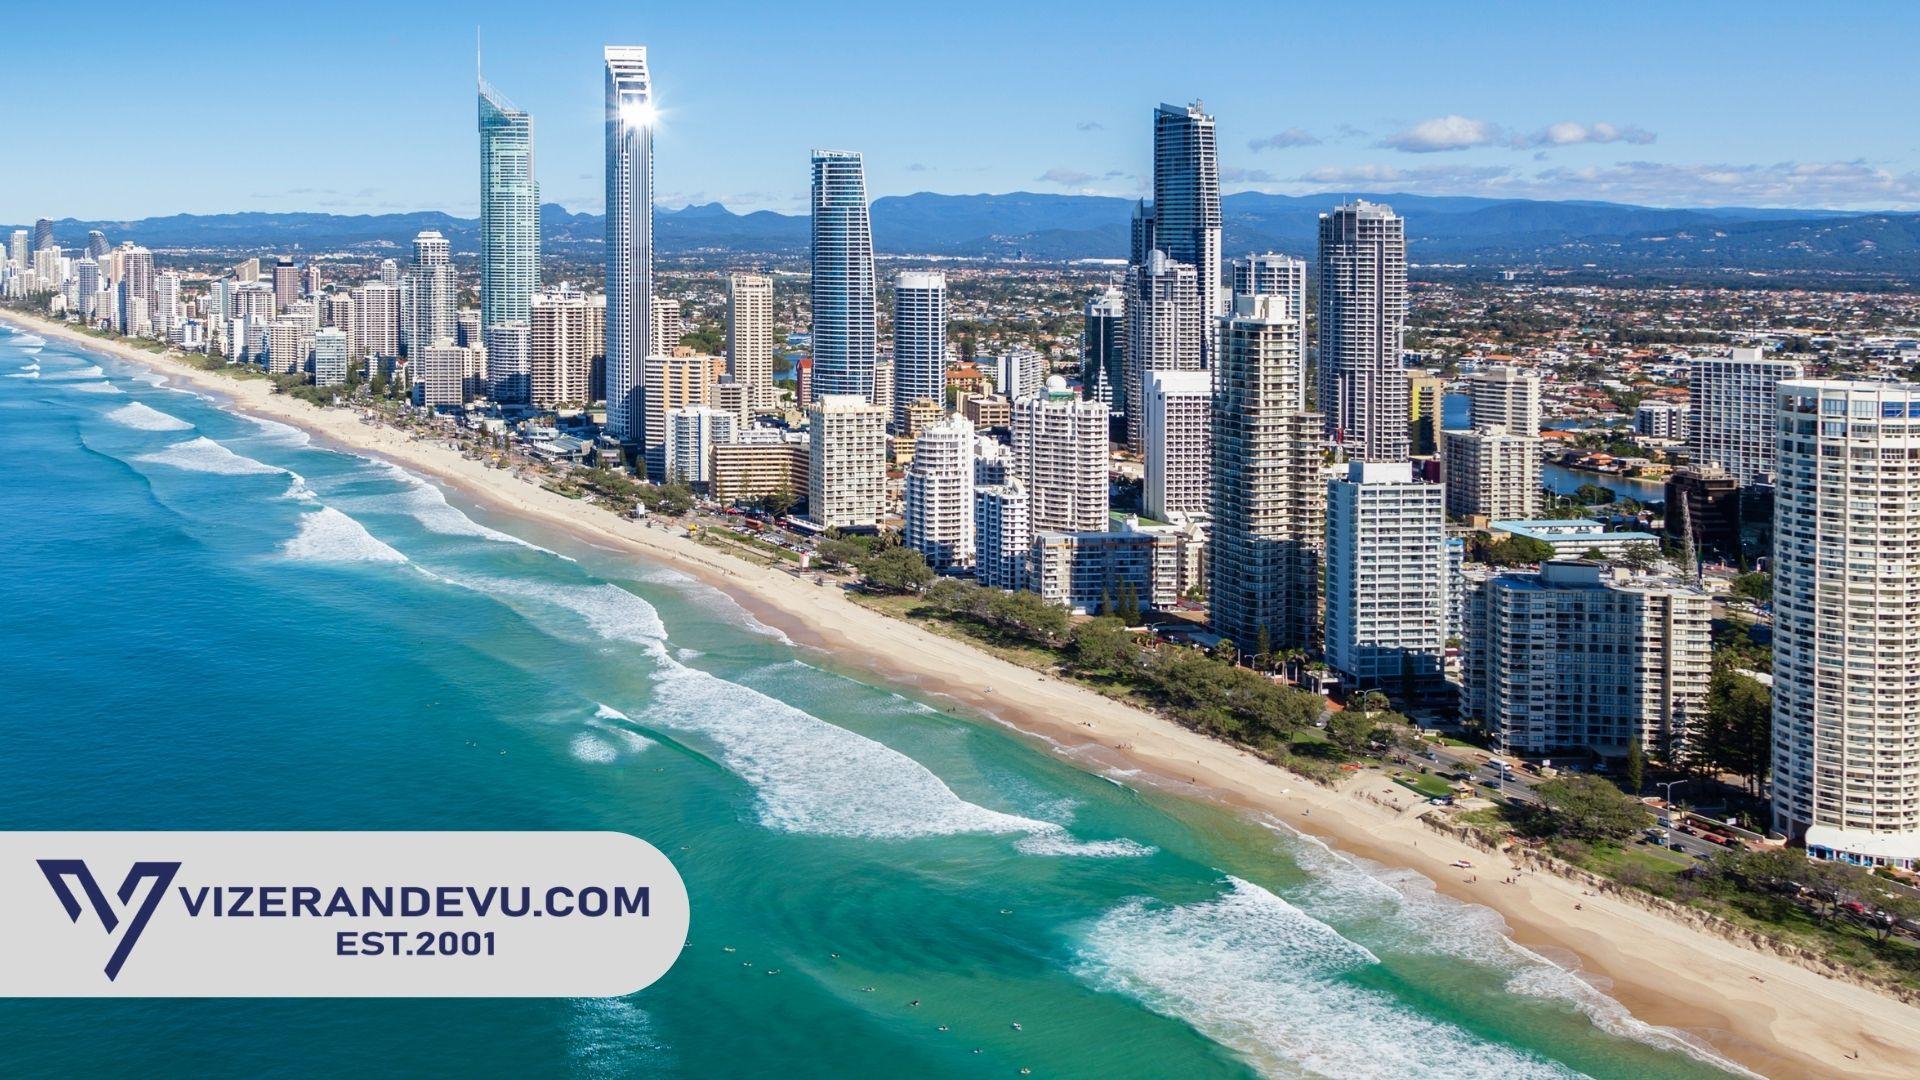 Avustralya Vize Formu ve Dilekçe 2021